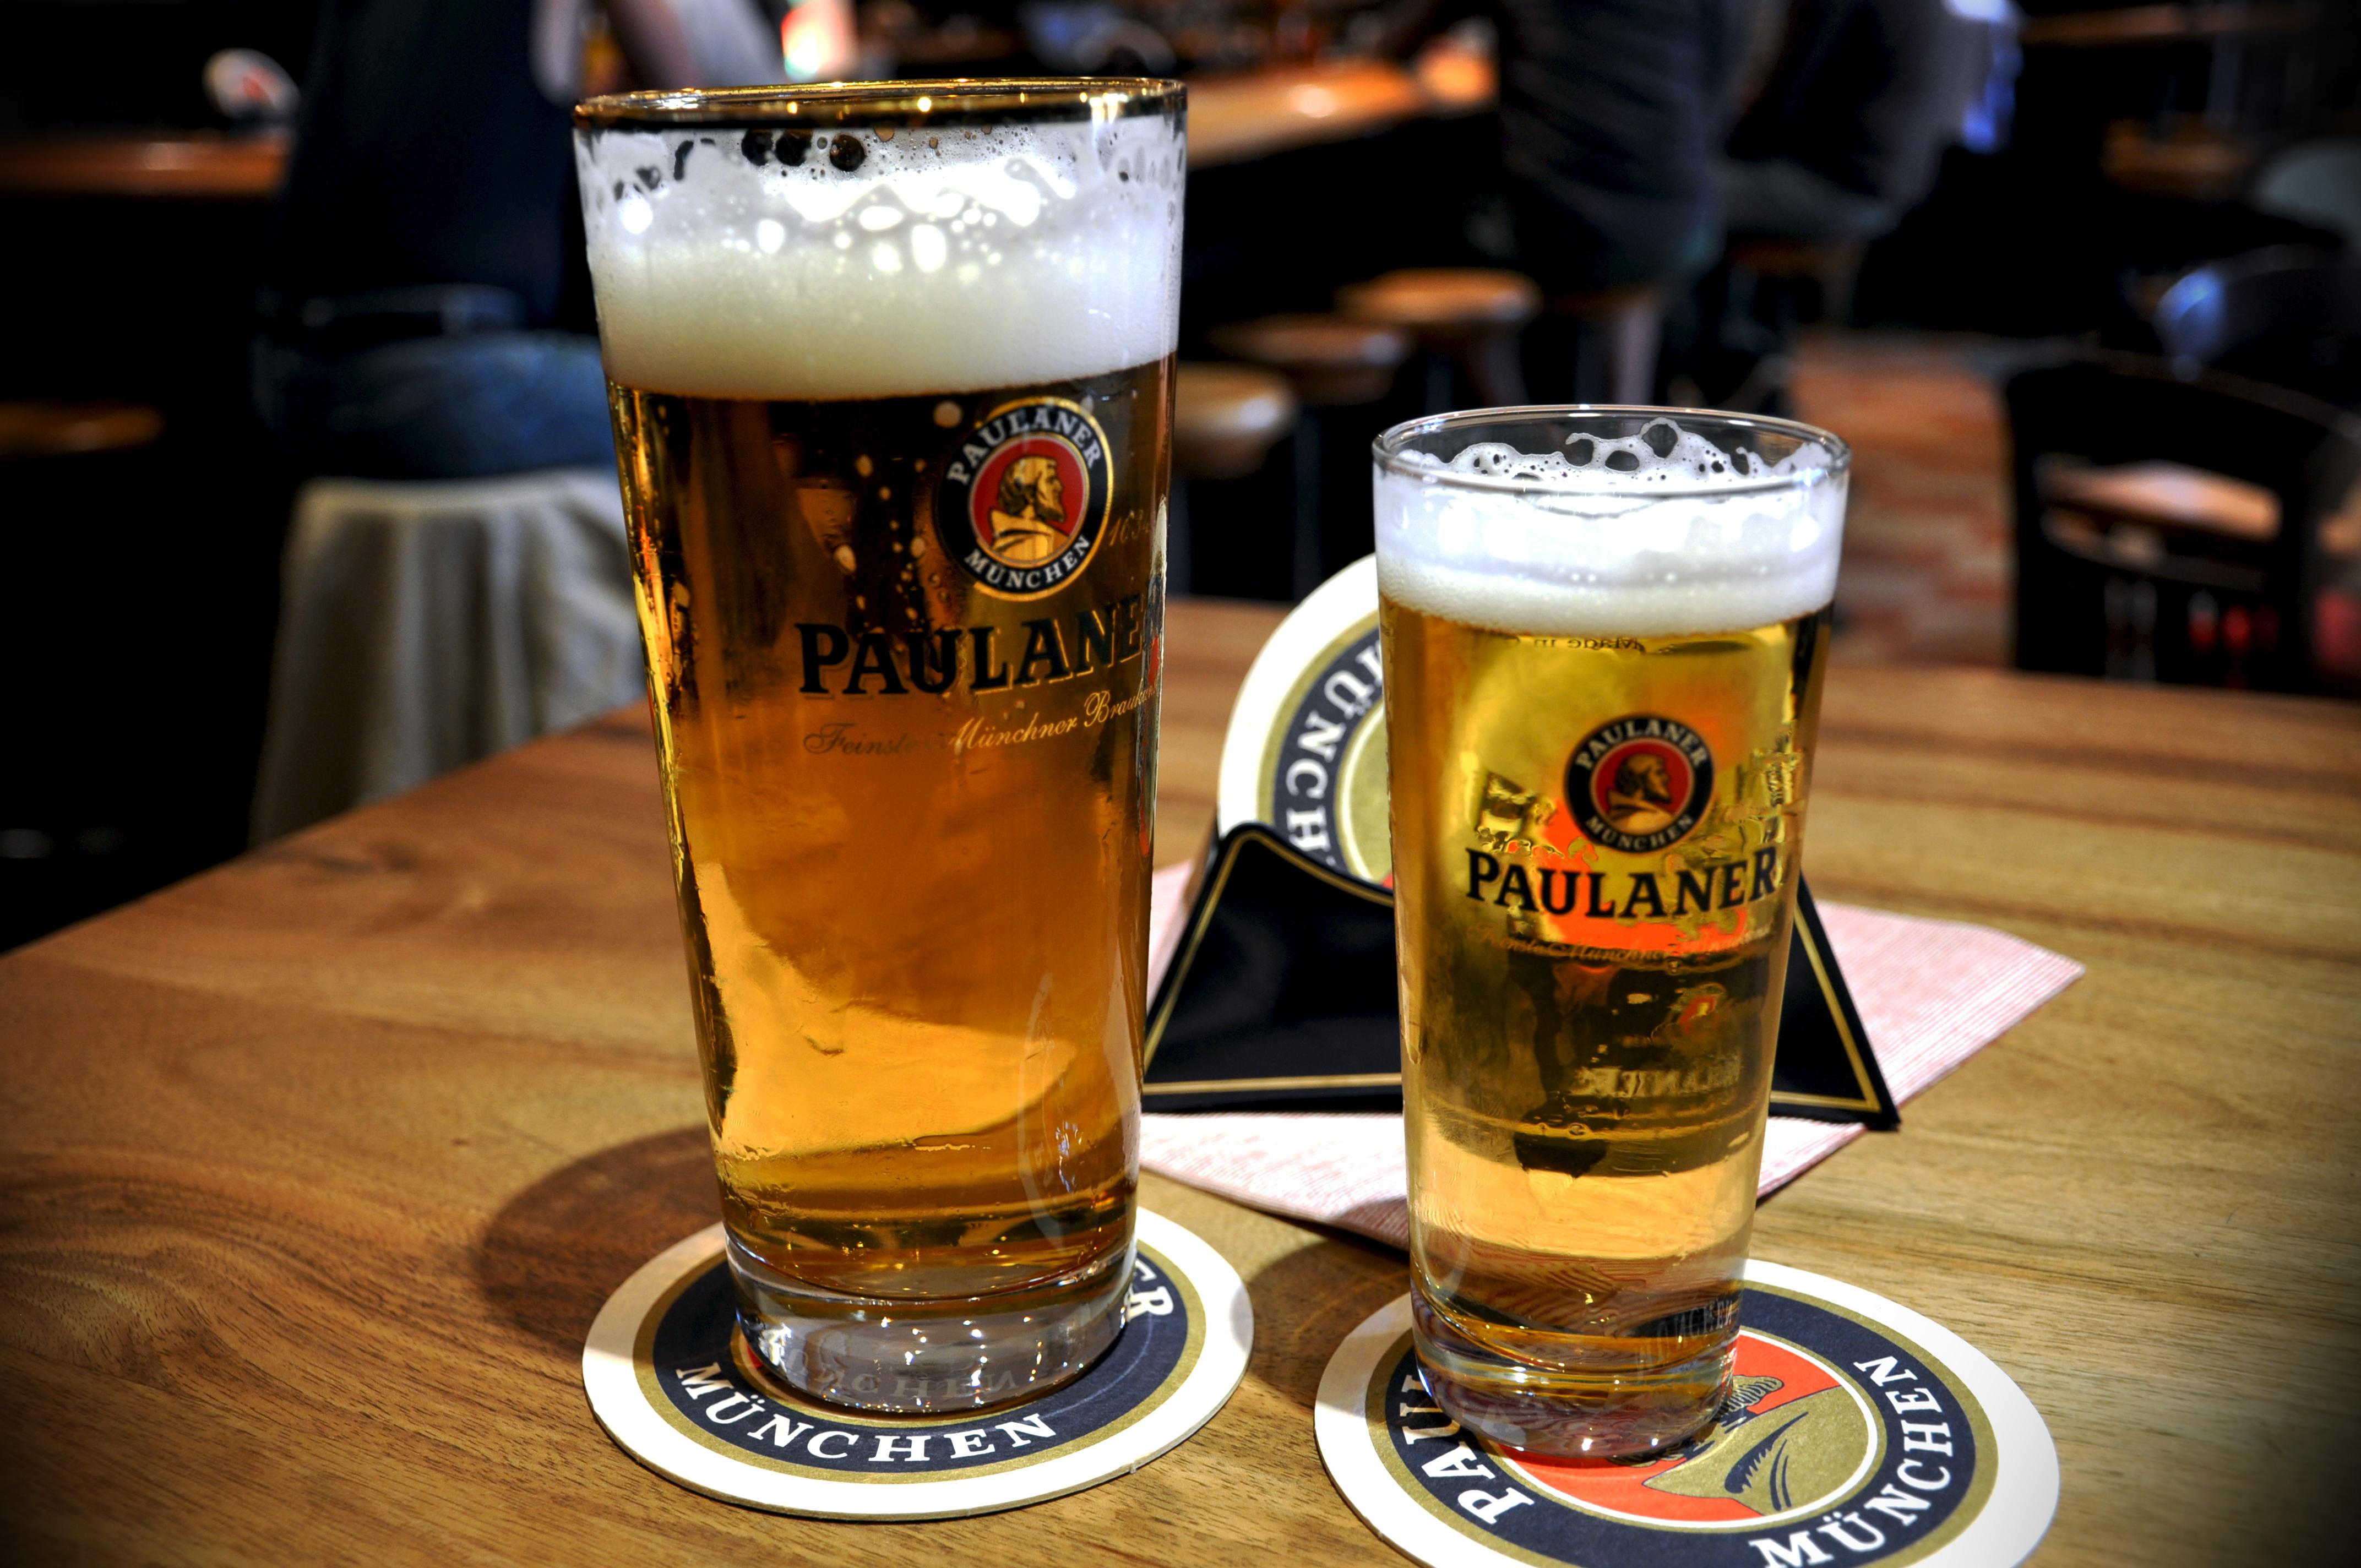 En Múnich se fabrica la famosa cerveza Paulaner